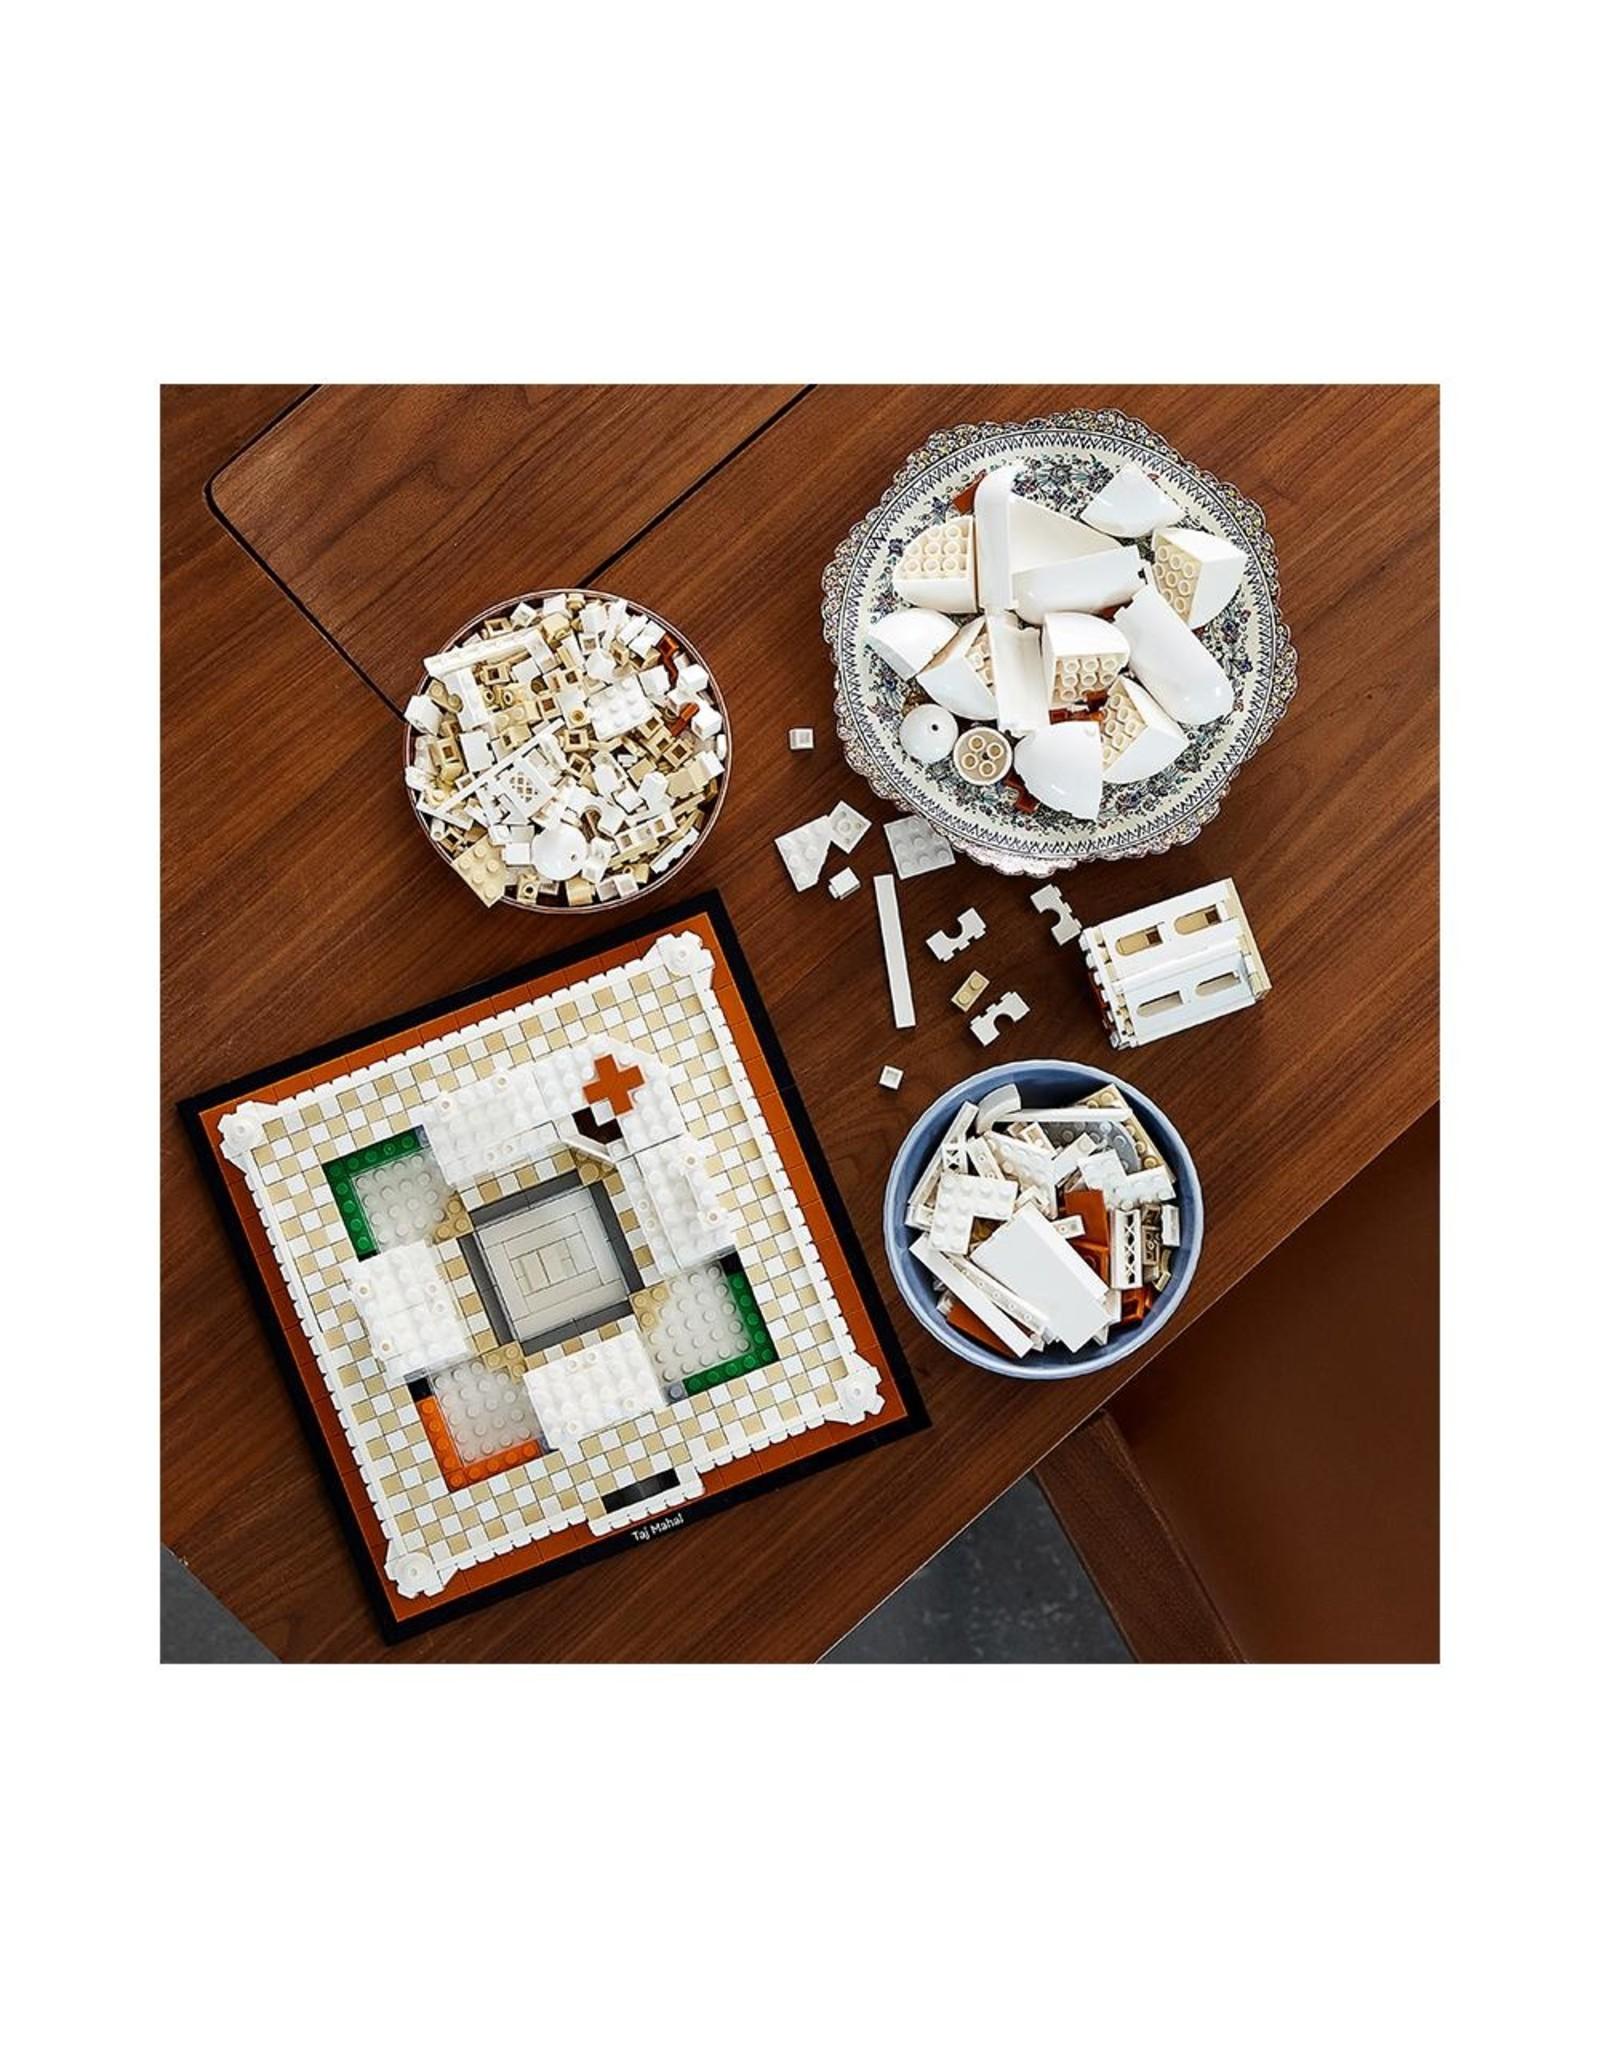 LEGO Architecture - 21056 - Taj Mahal